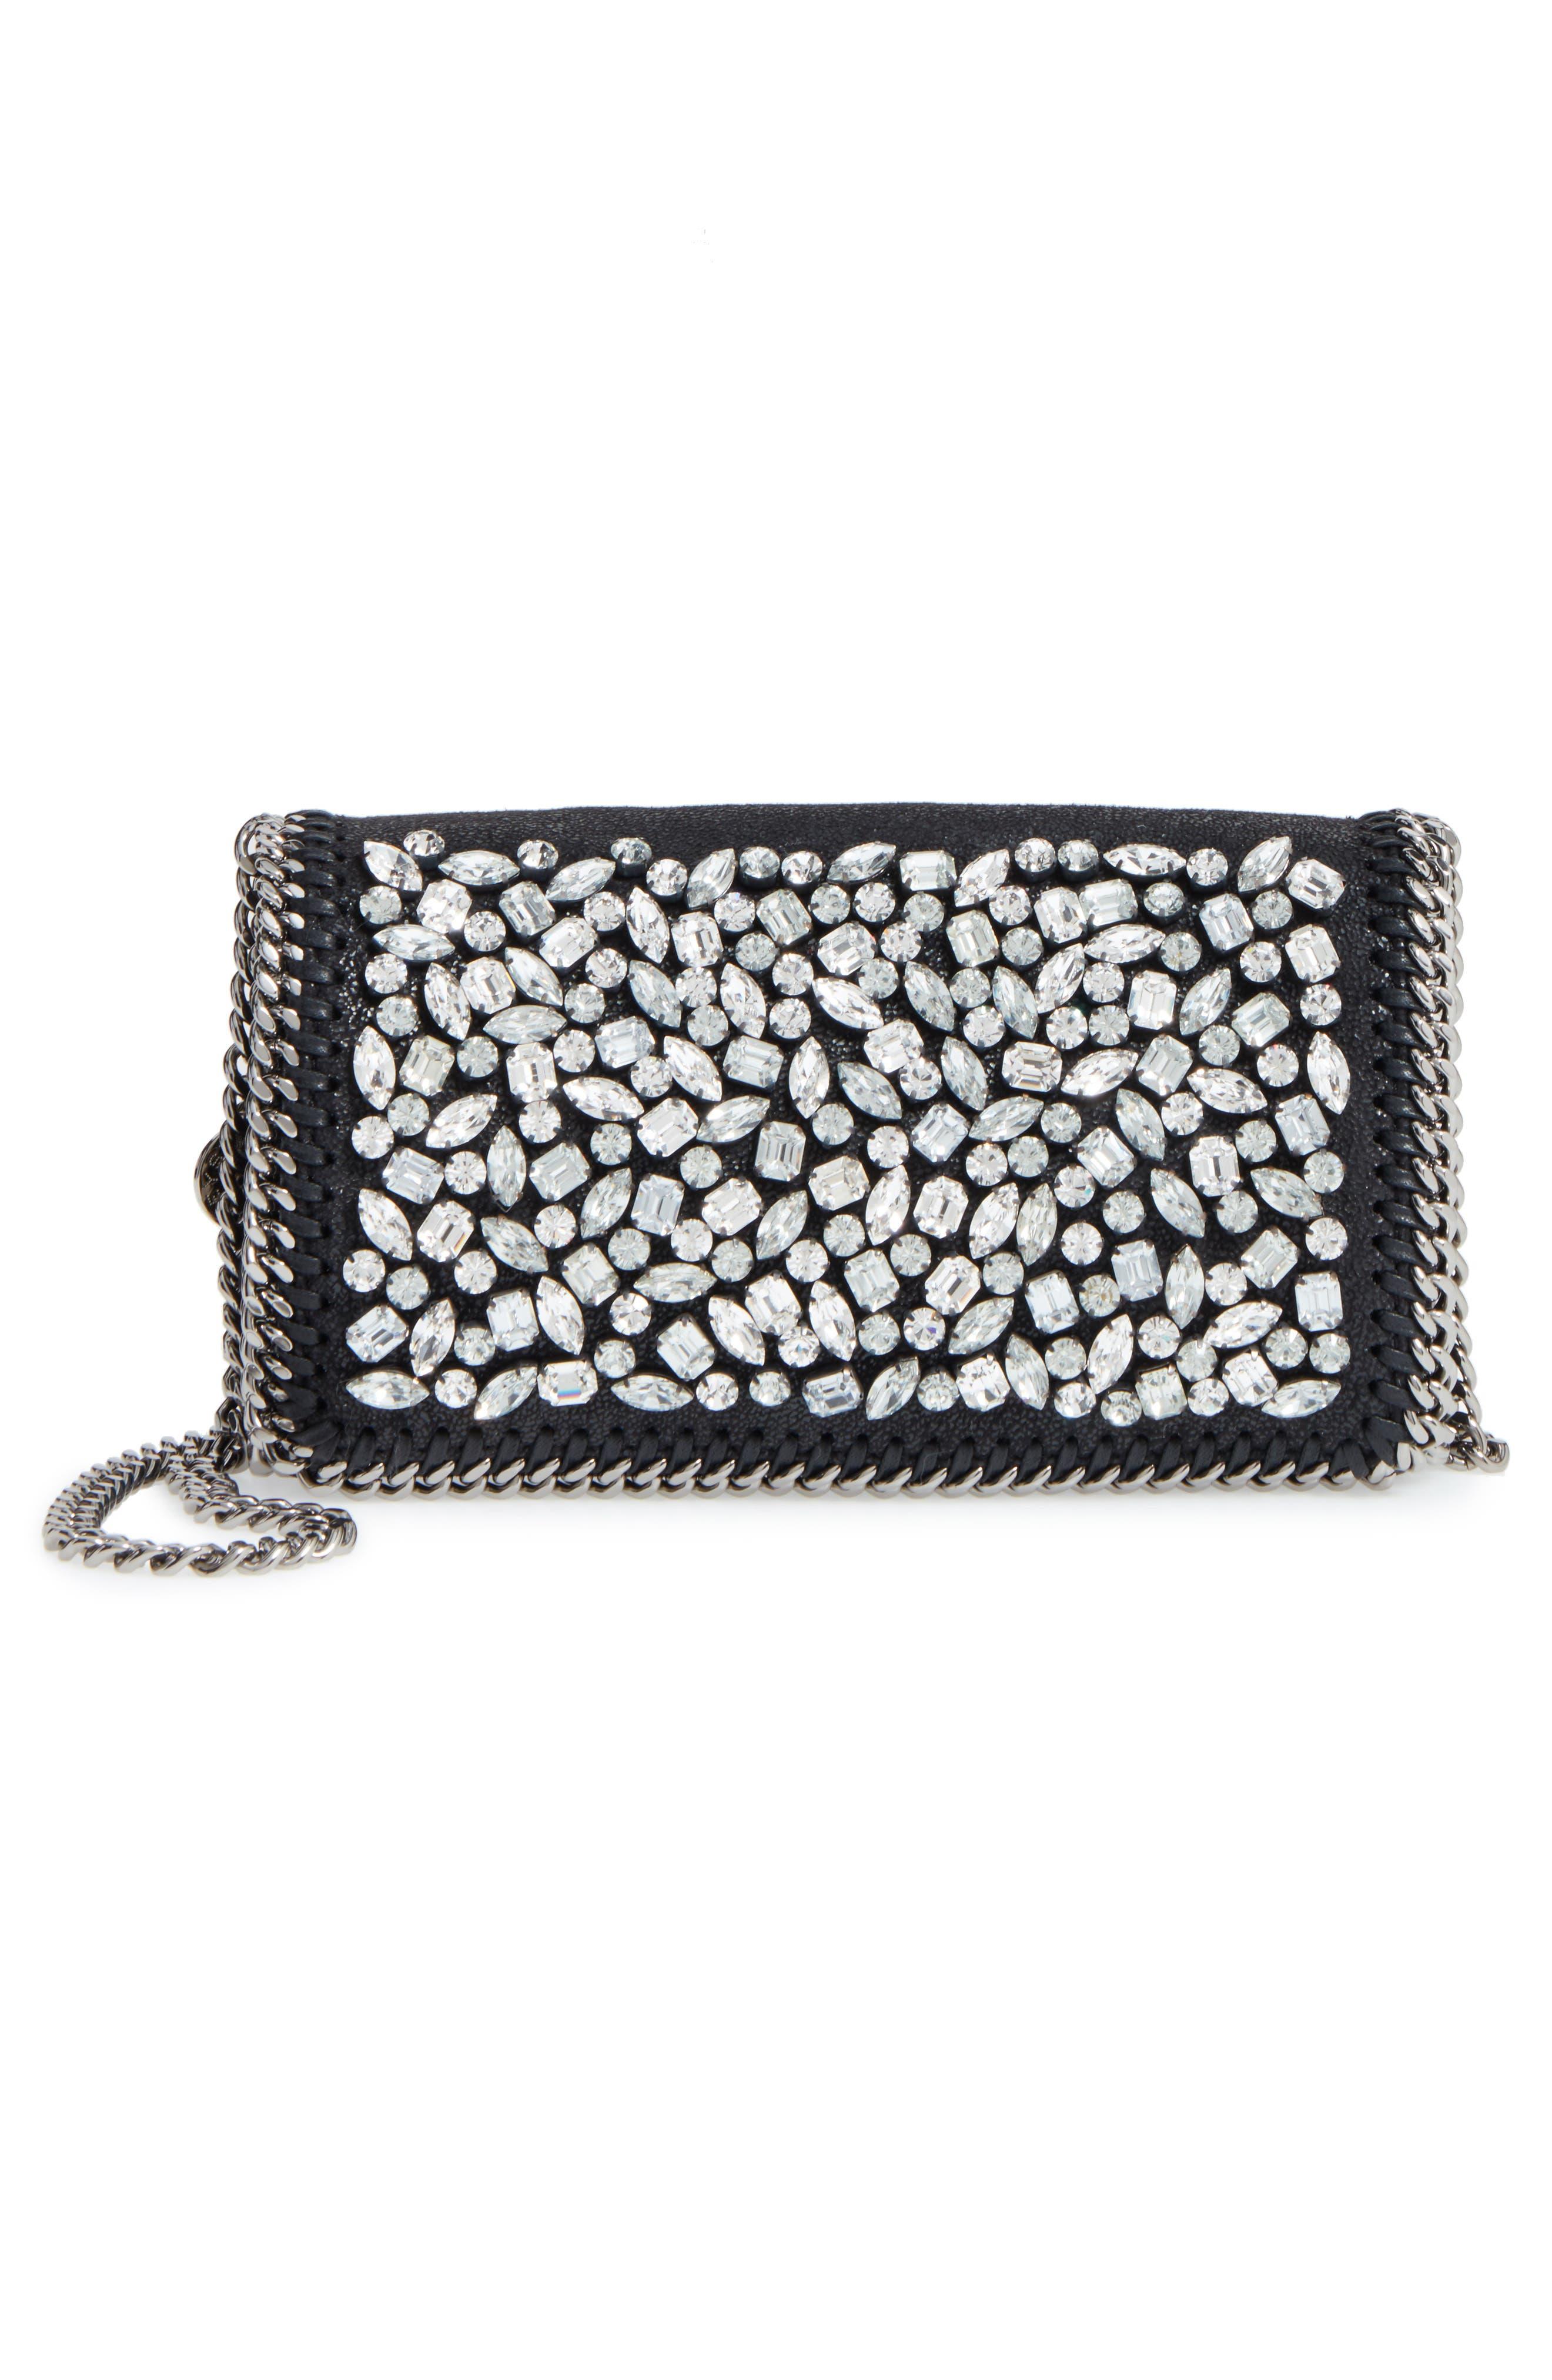 Main Image - Stella McCartney Small Fallabella Crystal Faux Leather Crossbody Bag